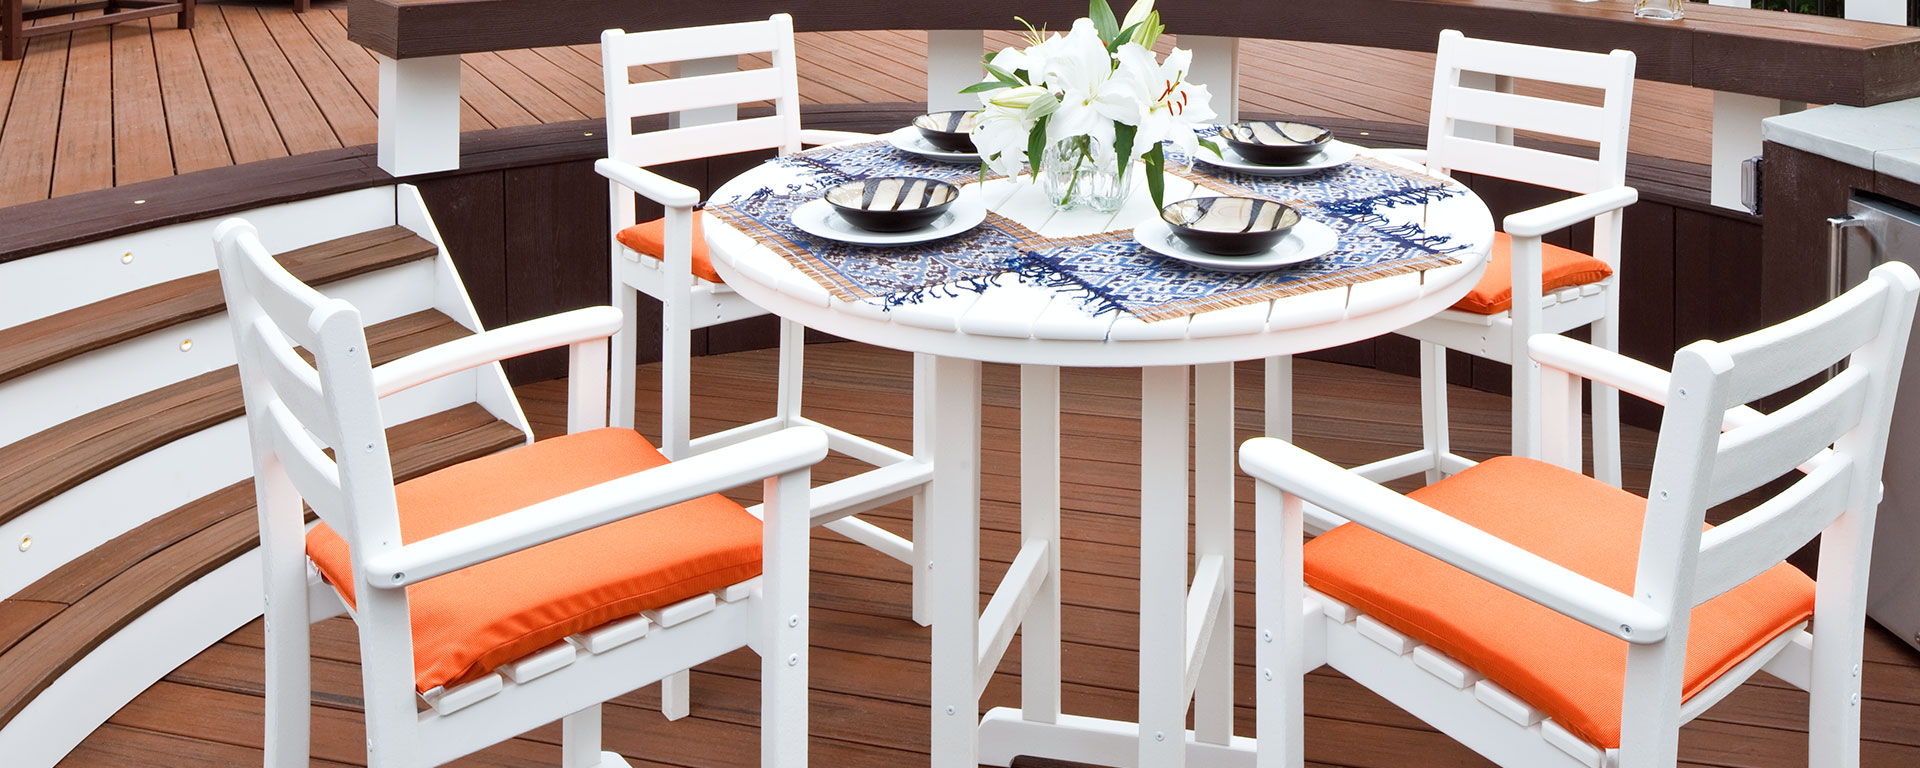 Popular-Pairs-Trex-Deck-Trex-Furniture-FEATURED